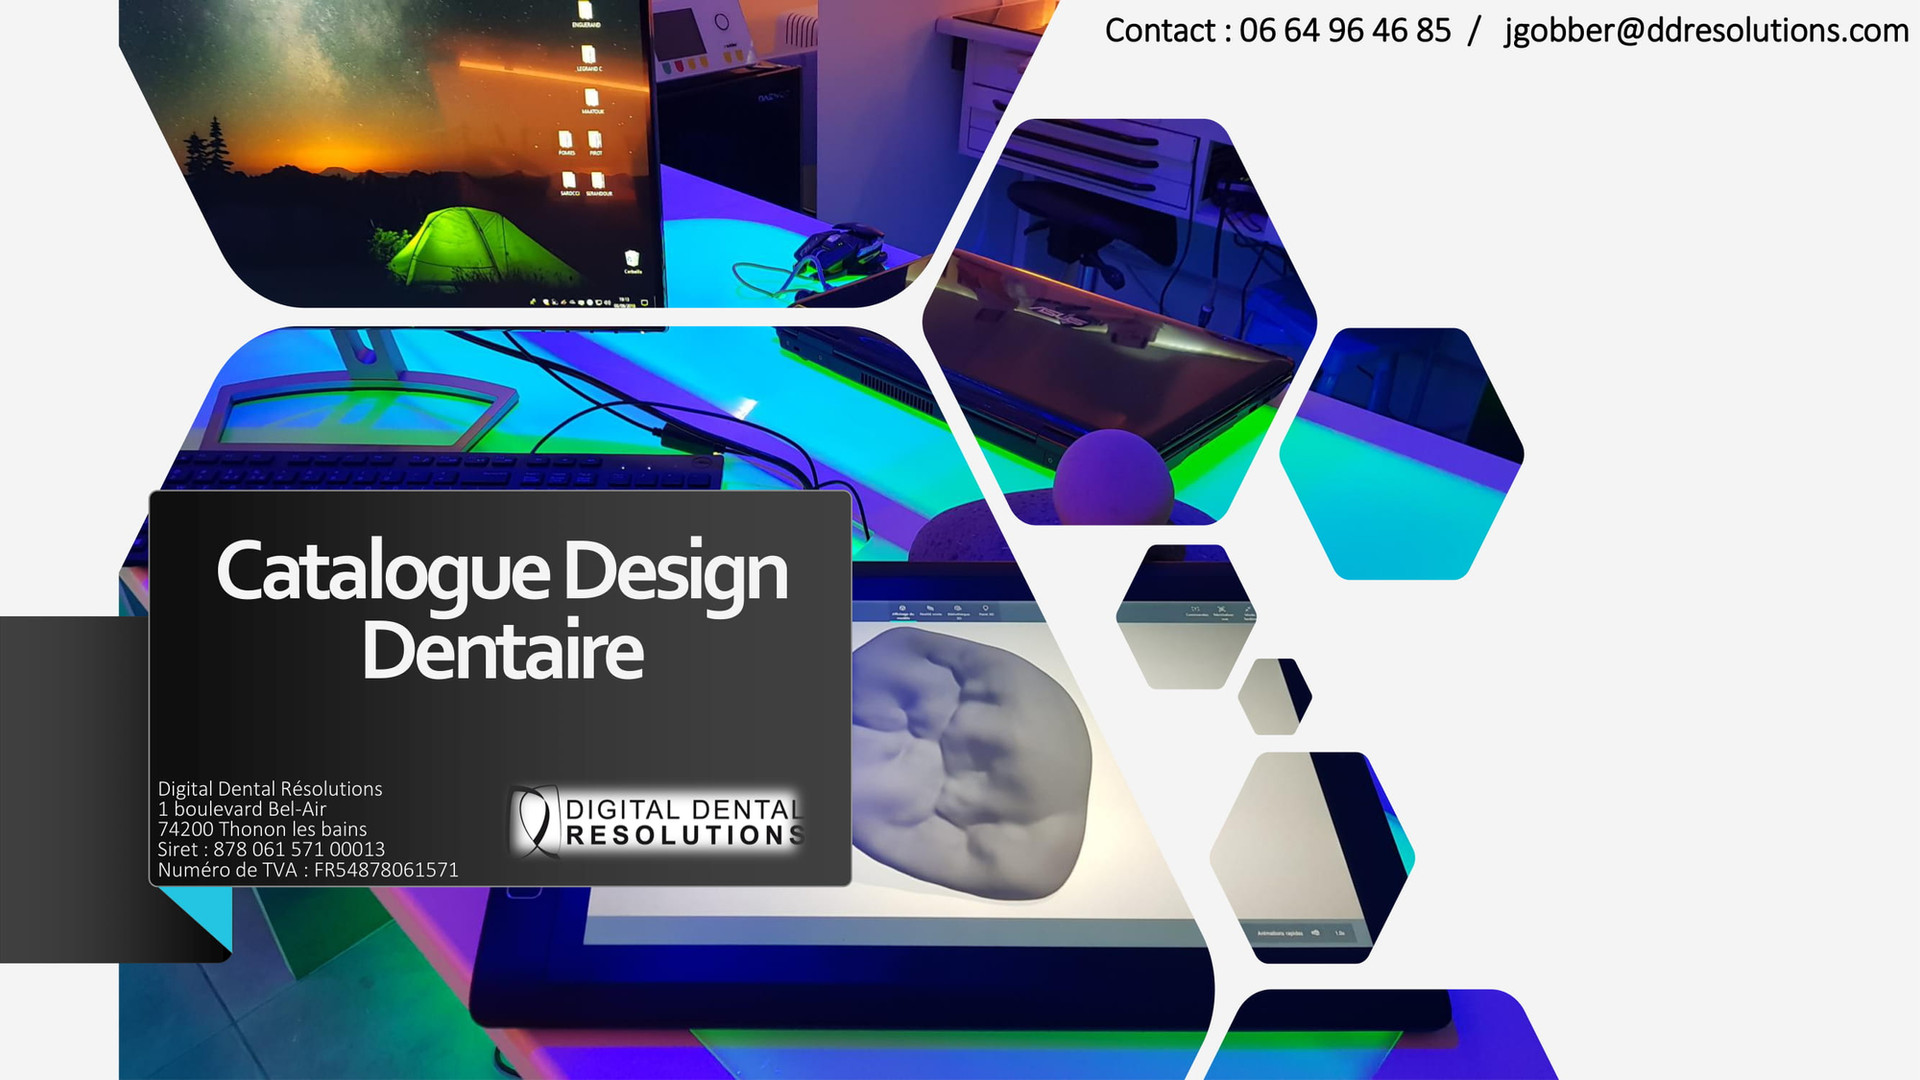 Catalogue Design Dentaire DDR-1.jpg